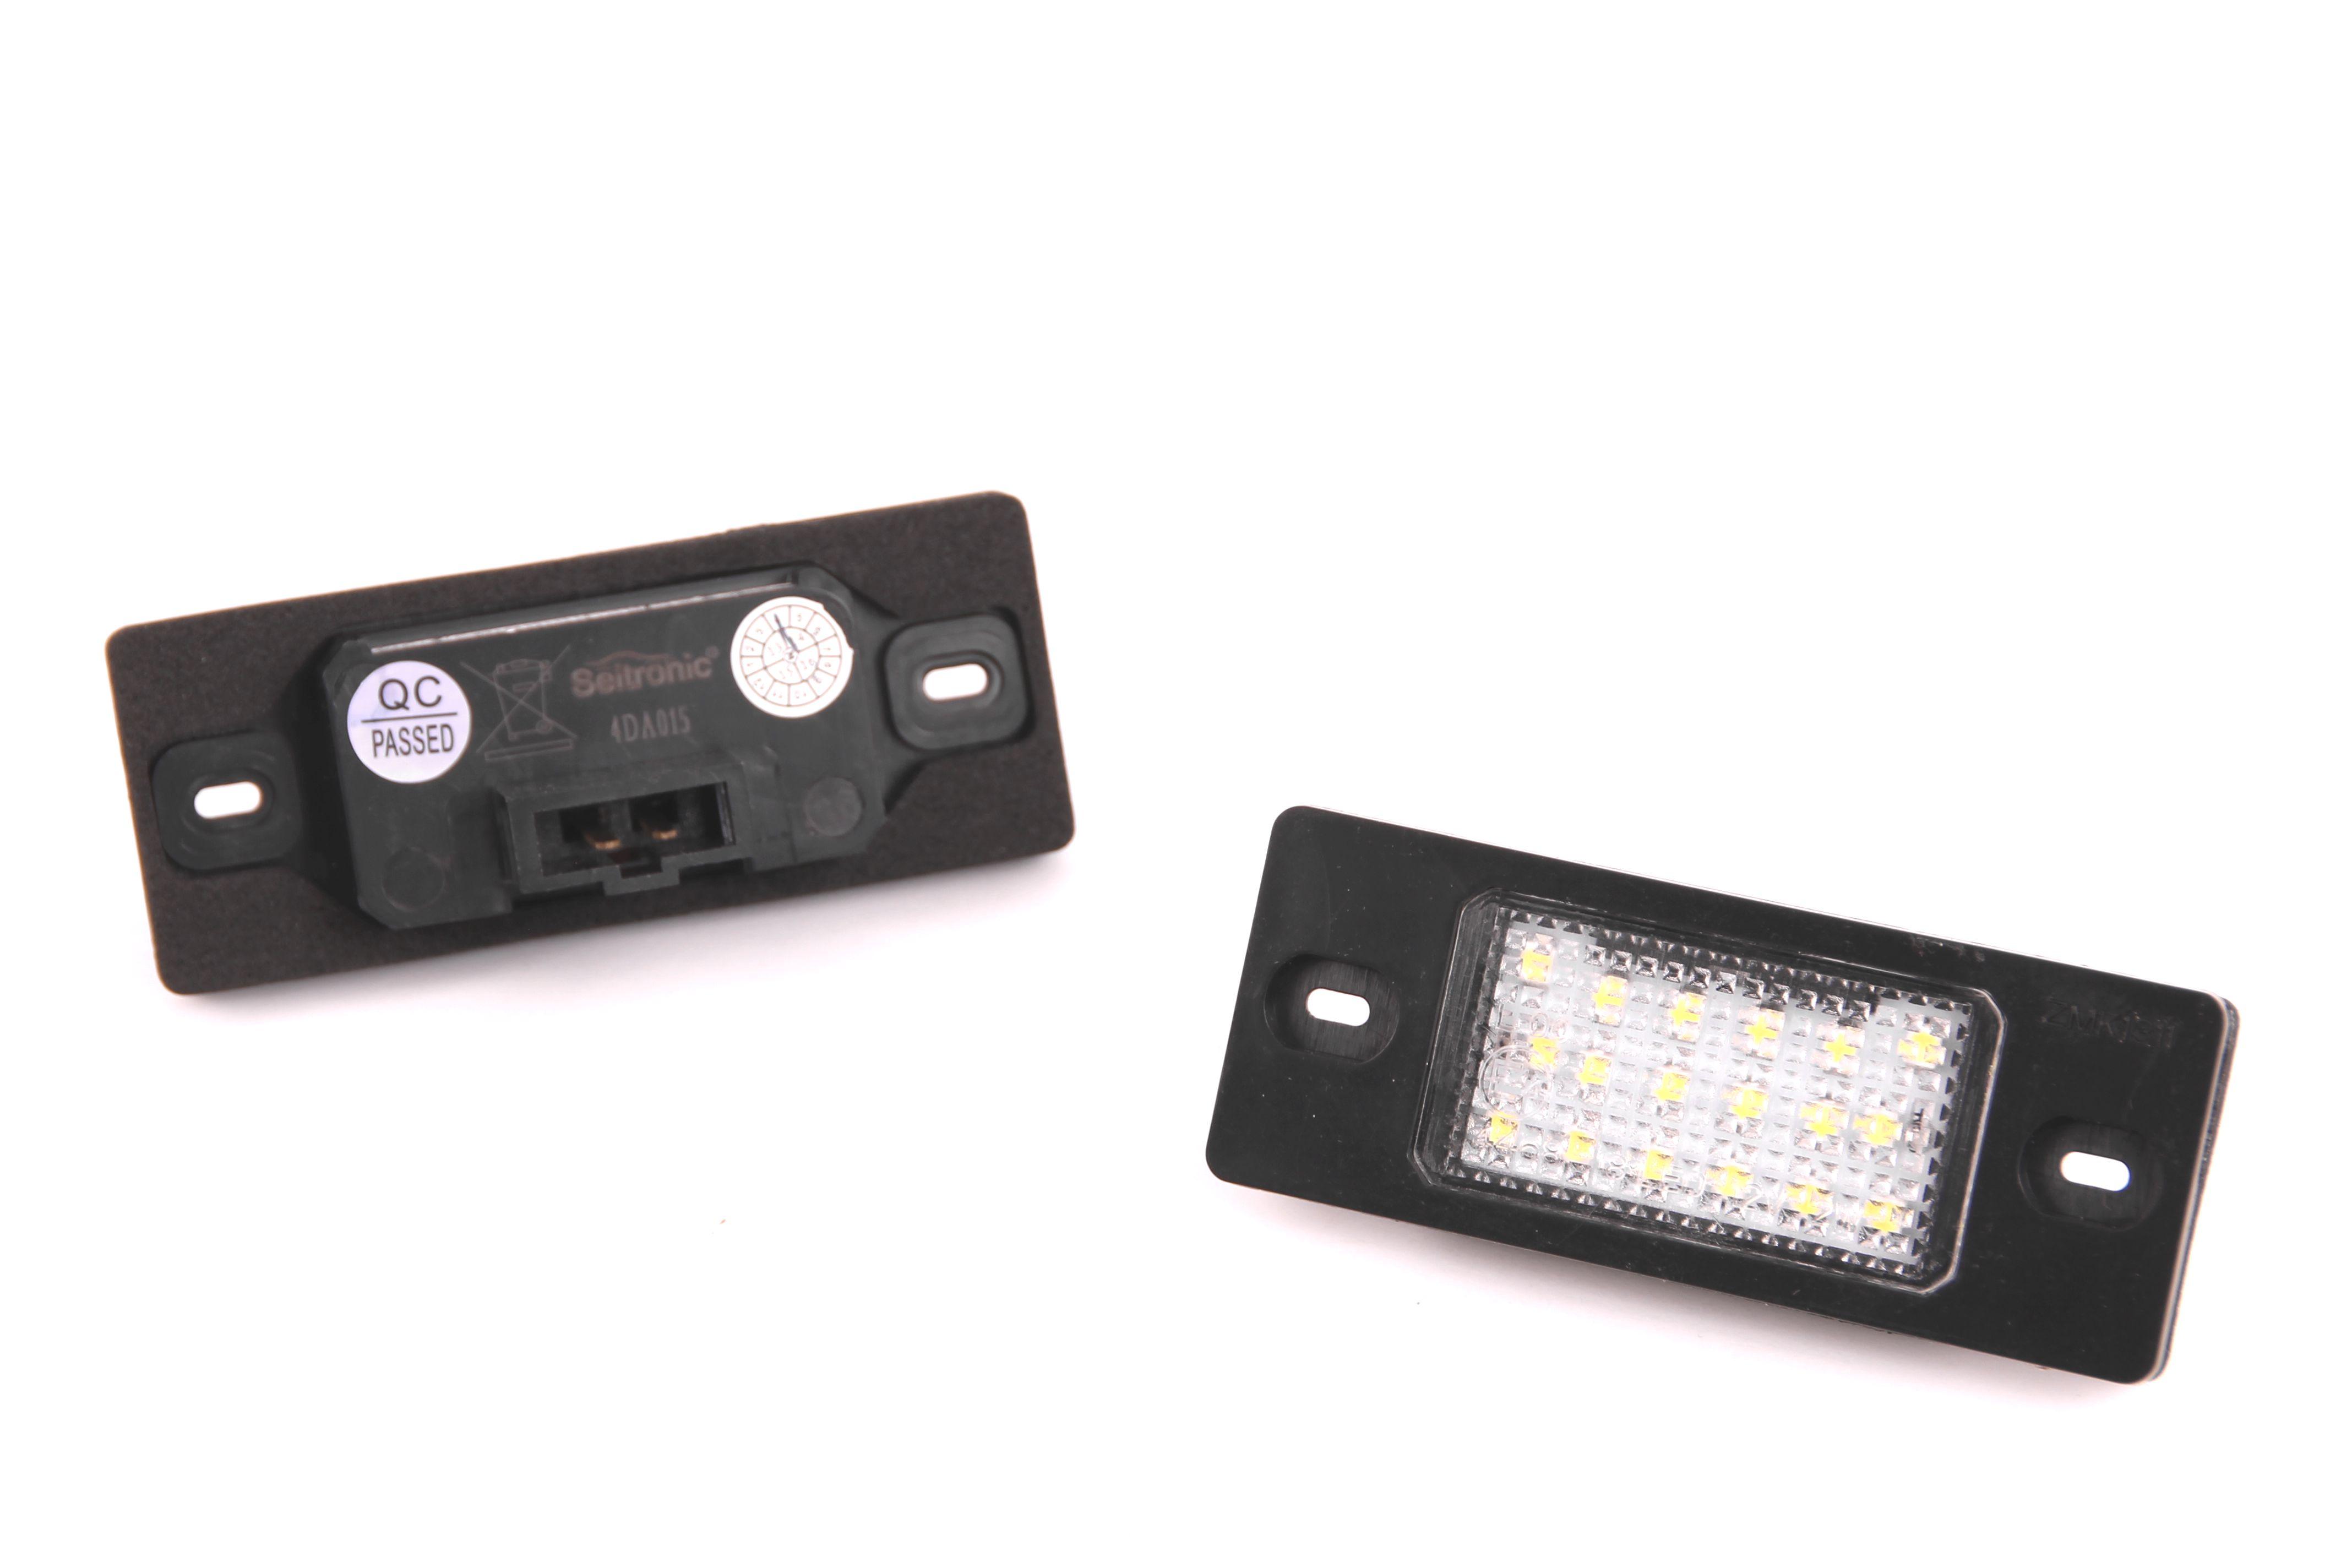 seitronic led kennzeichenbeleuchtung vw golf 5 variant bj. Black Bedroom Furniture Sets. Home Design Ideas